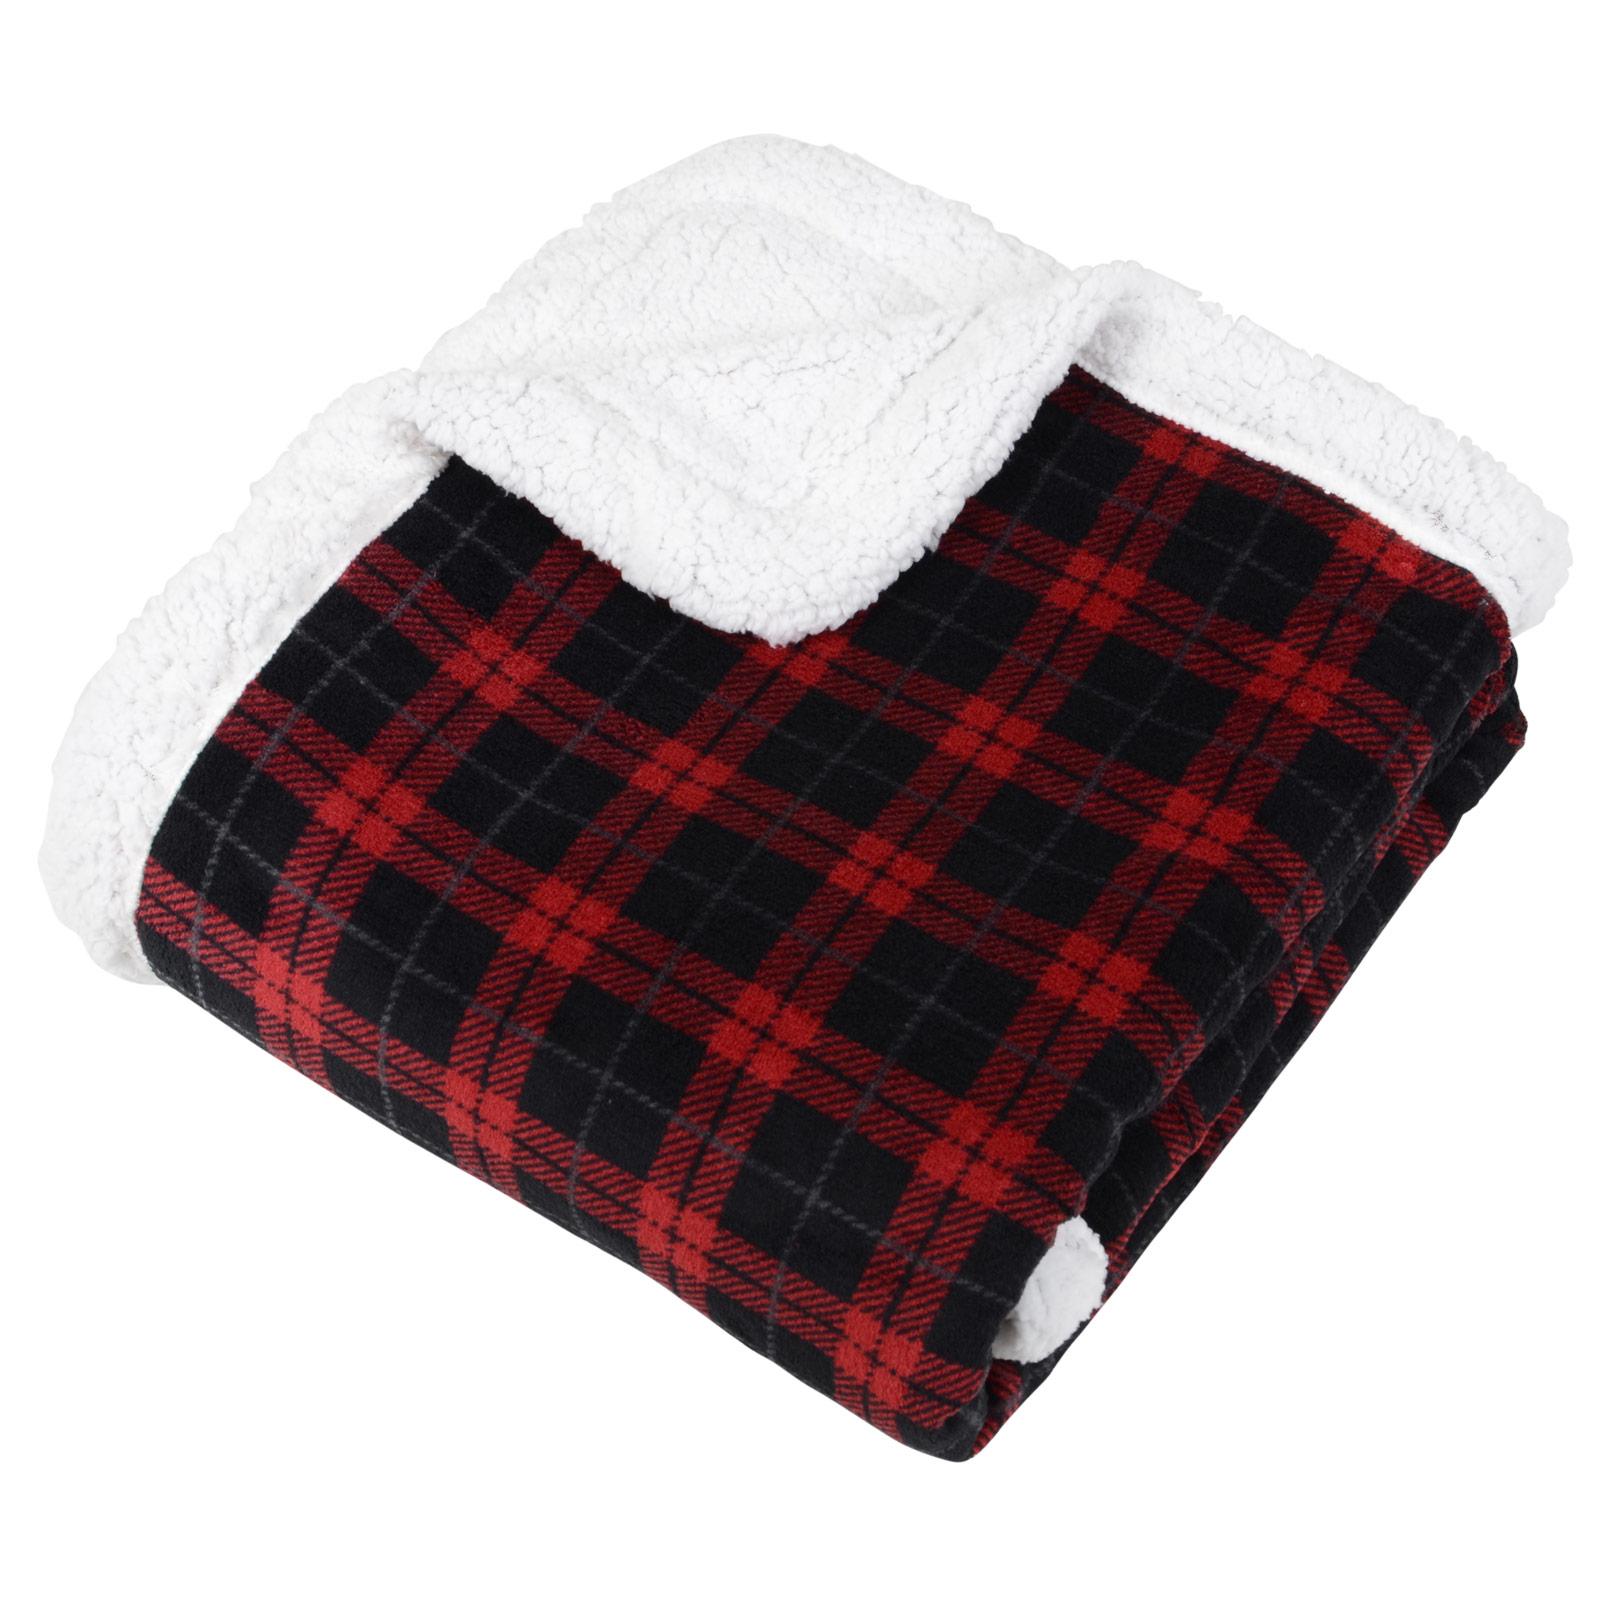 Supernatural Soft Fleece Throw Blanket For Bed Sofa